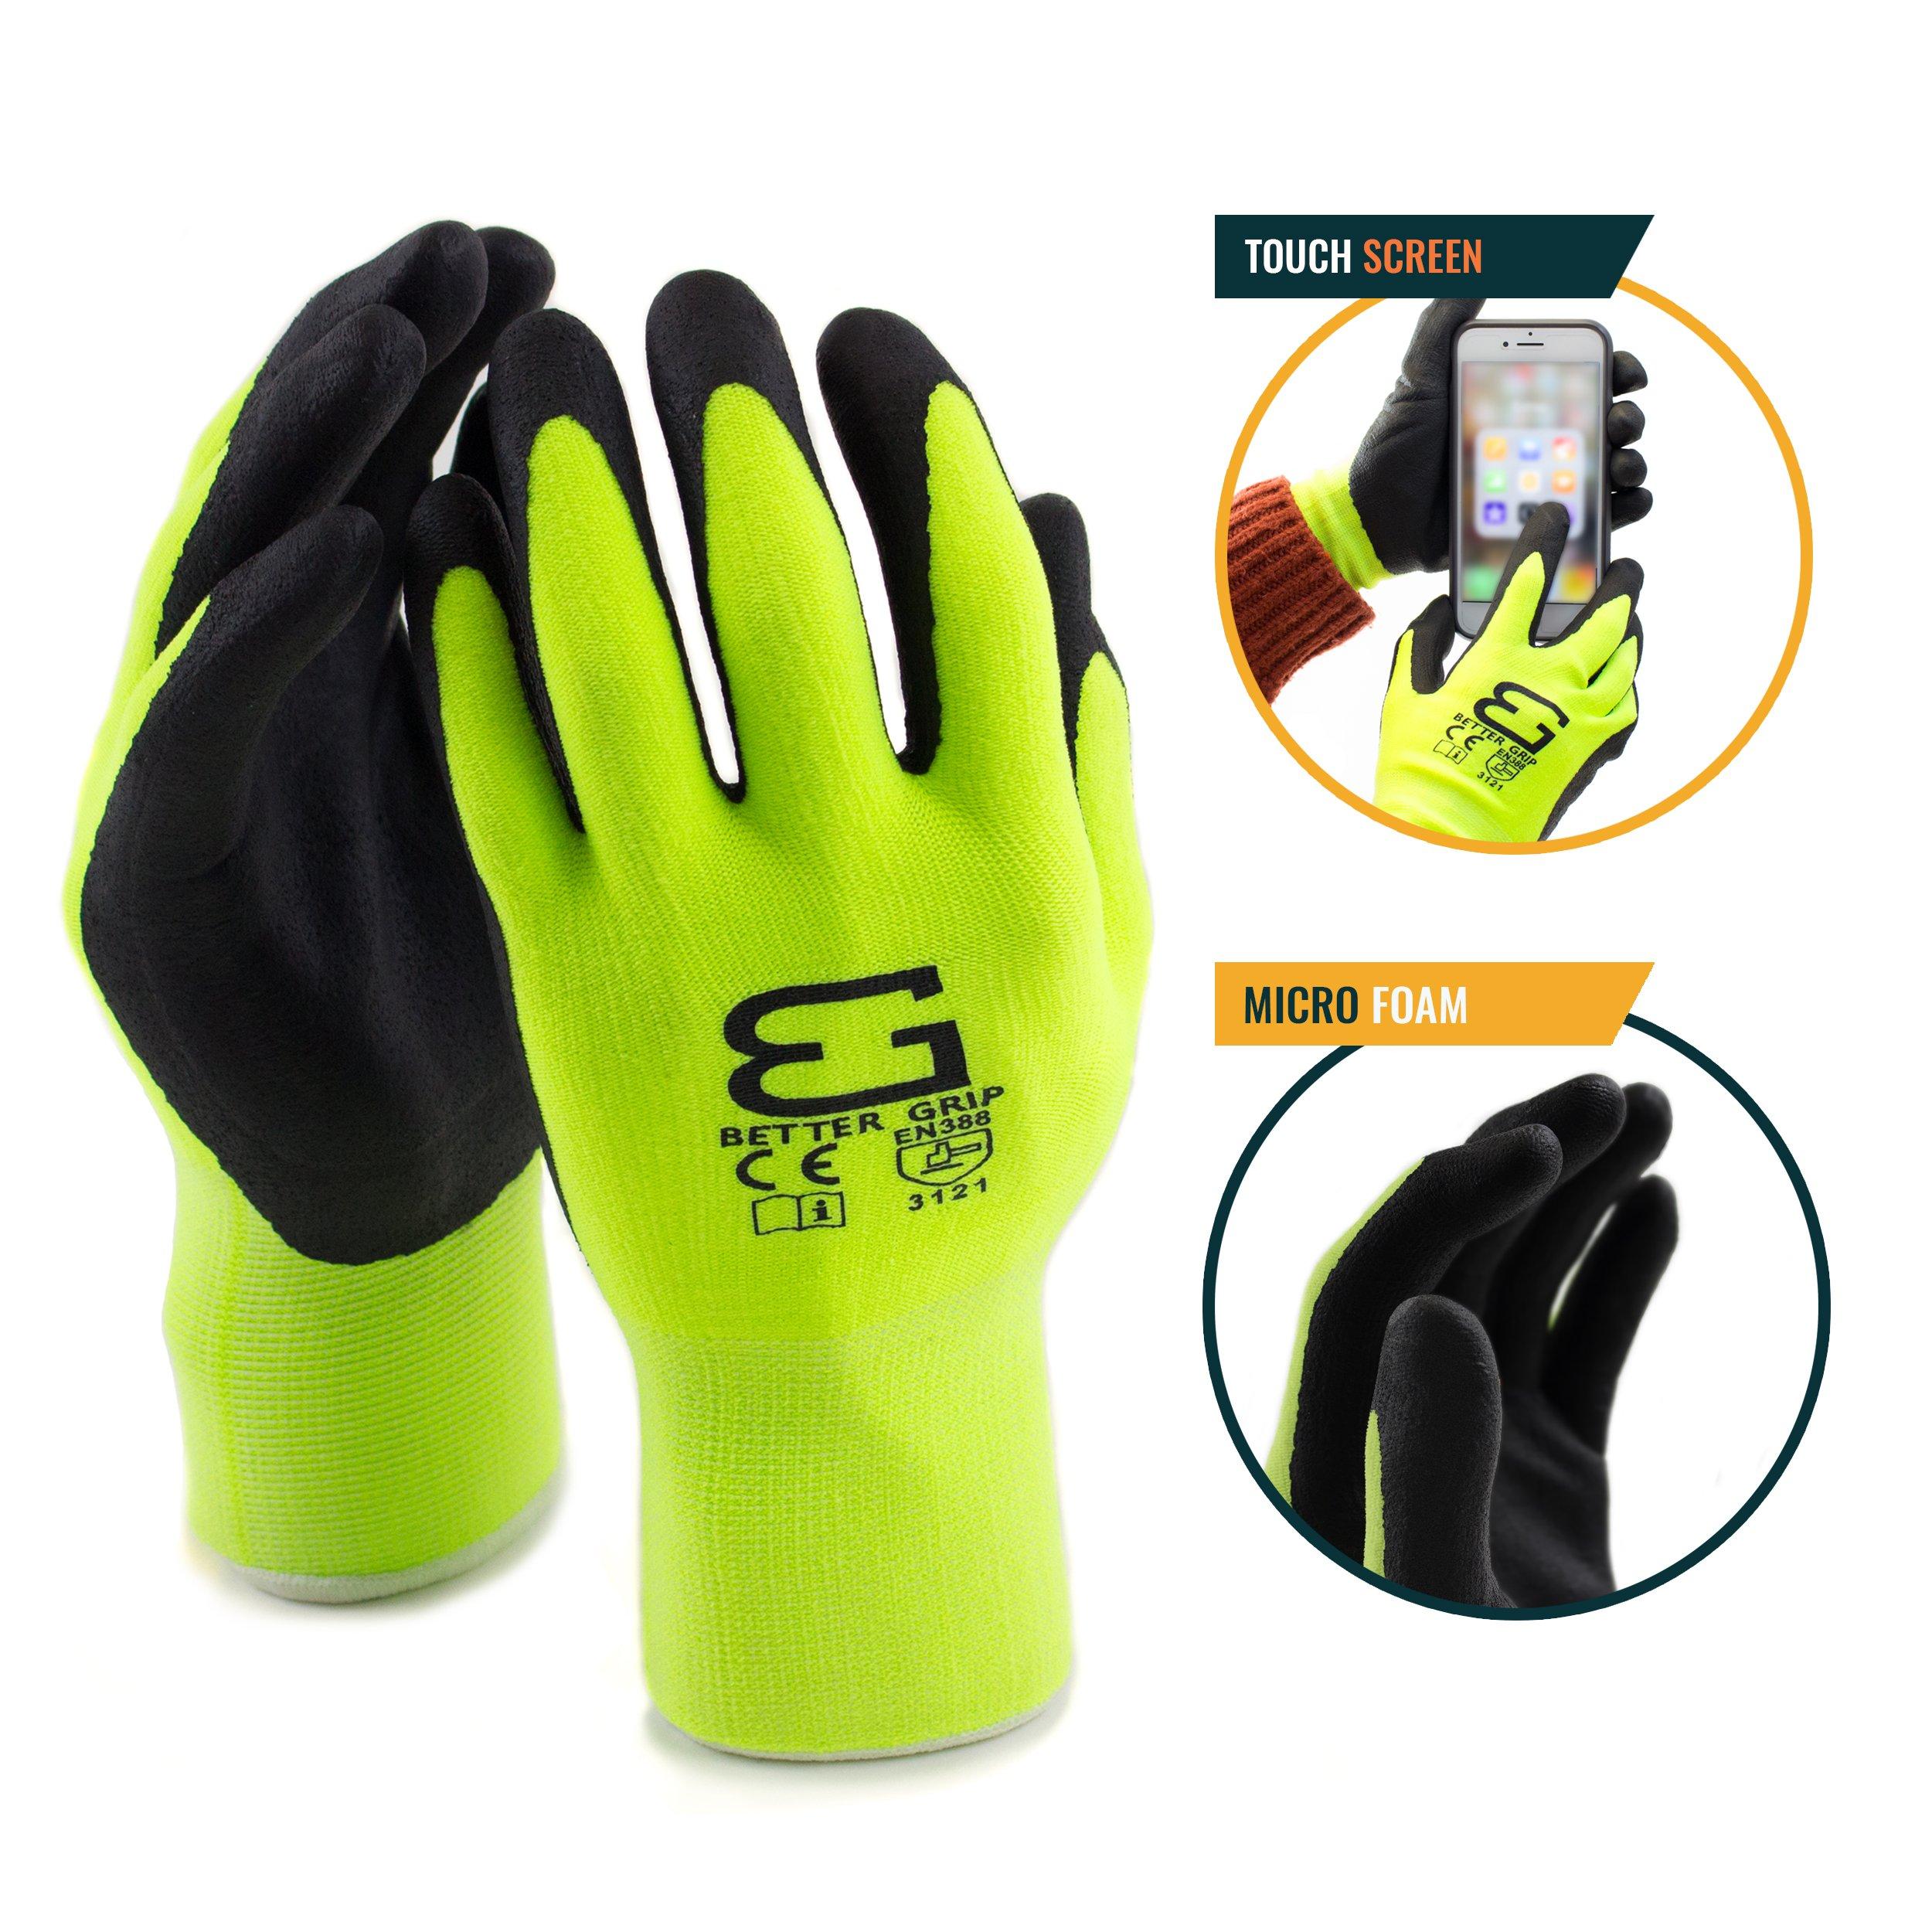 Spidergard SPL-RR50 50 Foot Wire Rope Self-Retracting Lifeline with Swivel Hook and Carabiner w/ Micro Foam Work Glove by Spidergard (Image #8)